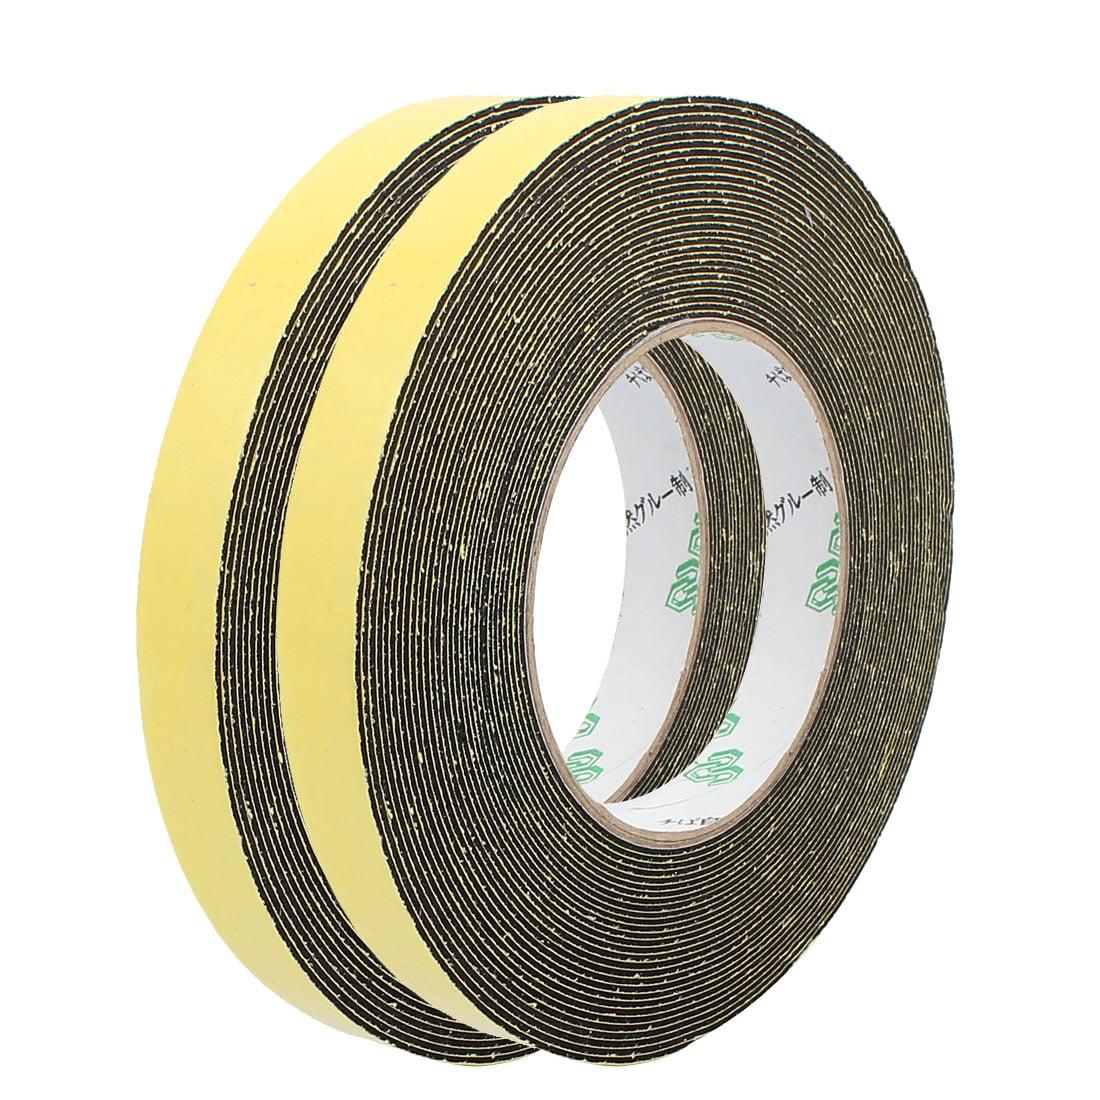 2Pcs 15mm Width 1mm Thickness Single Side Sponge Foam Tape Black 10 Meter Length - image 4 of 4